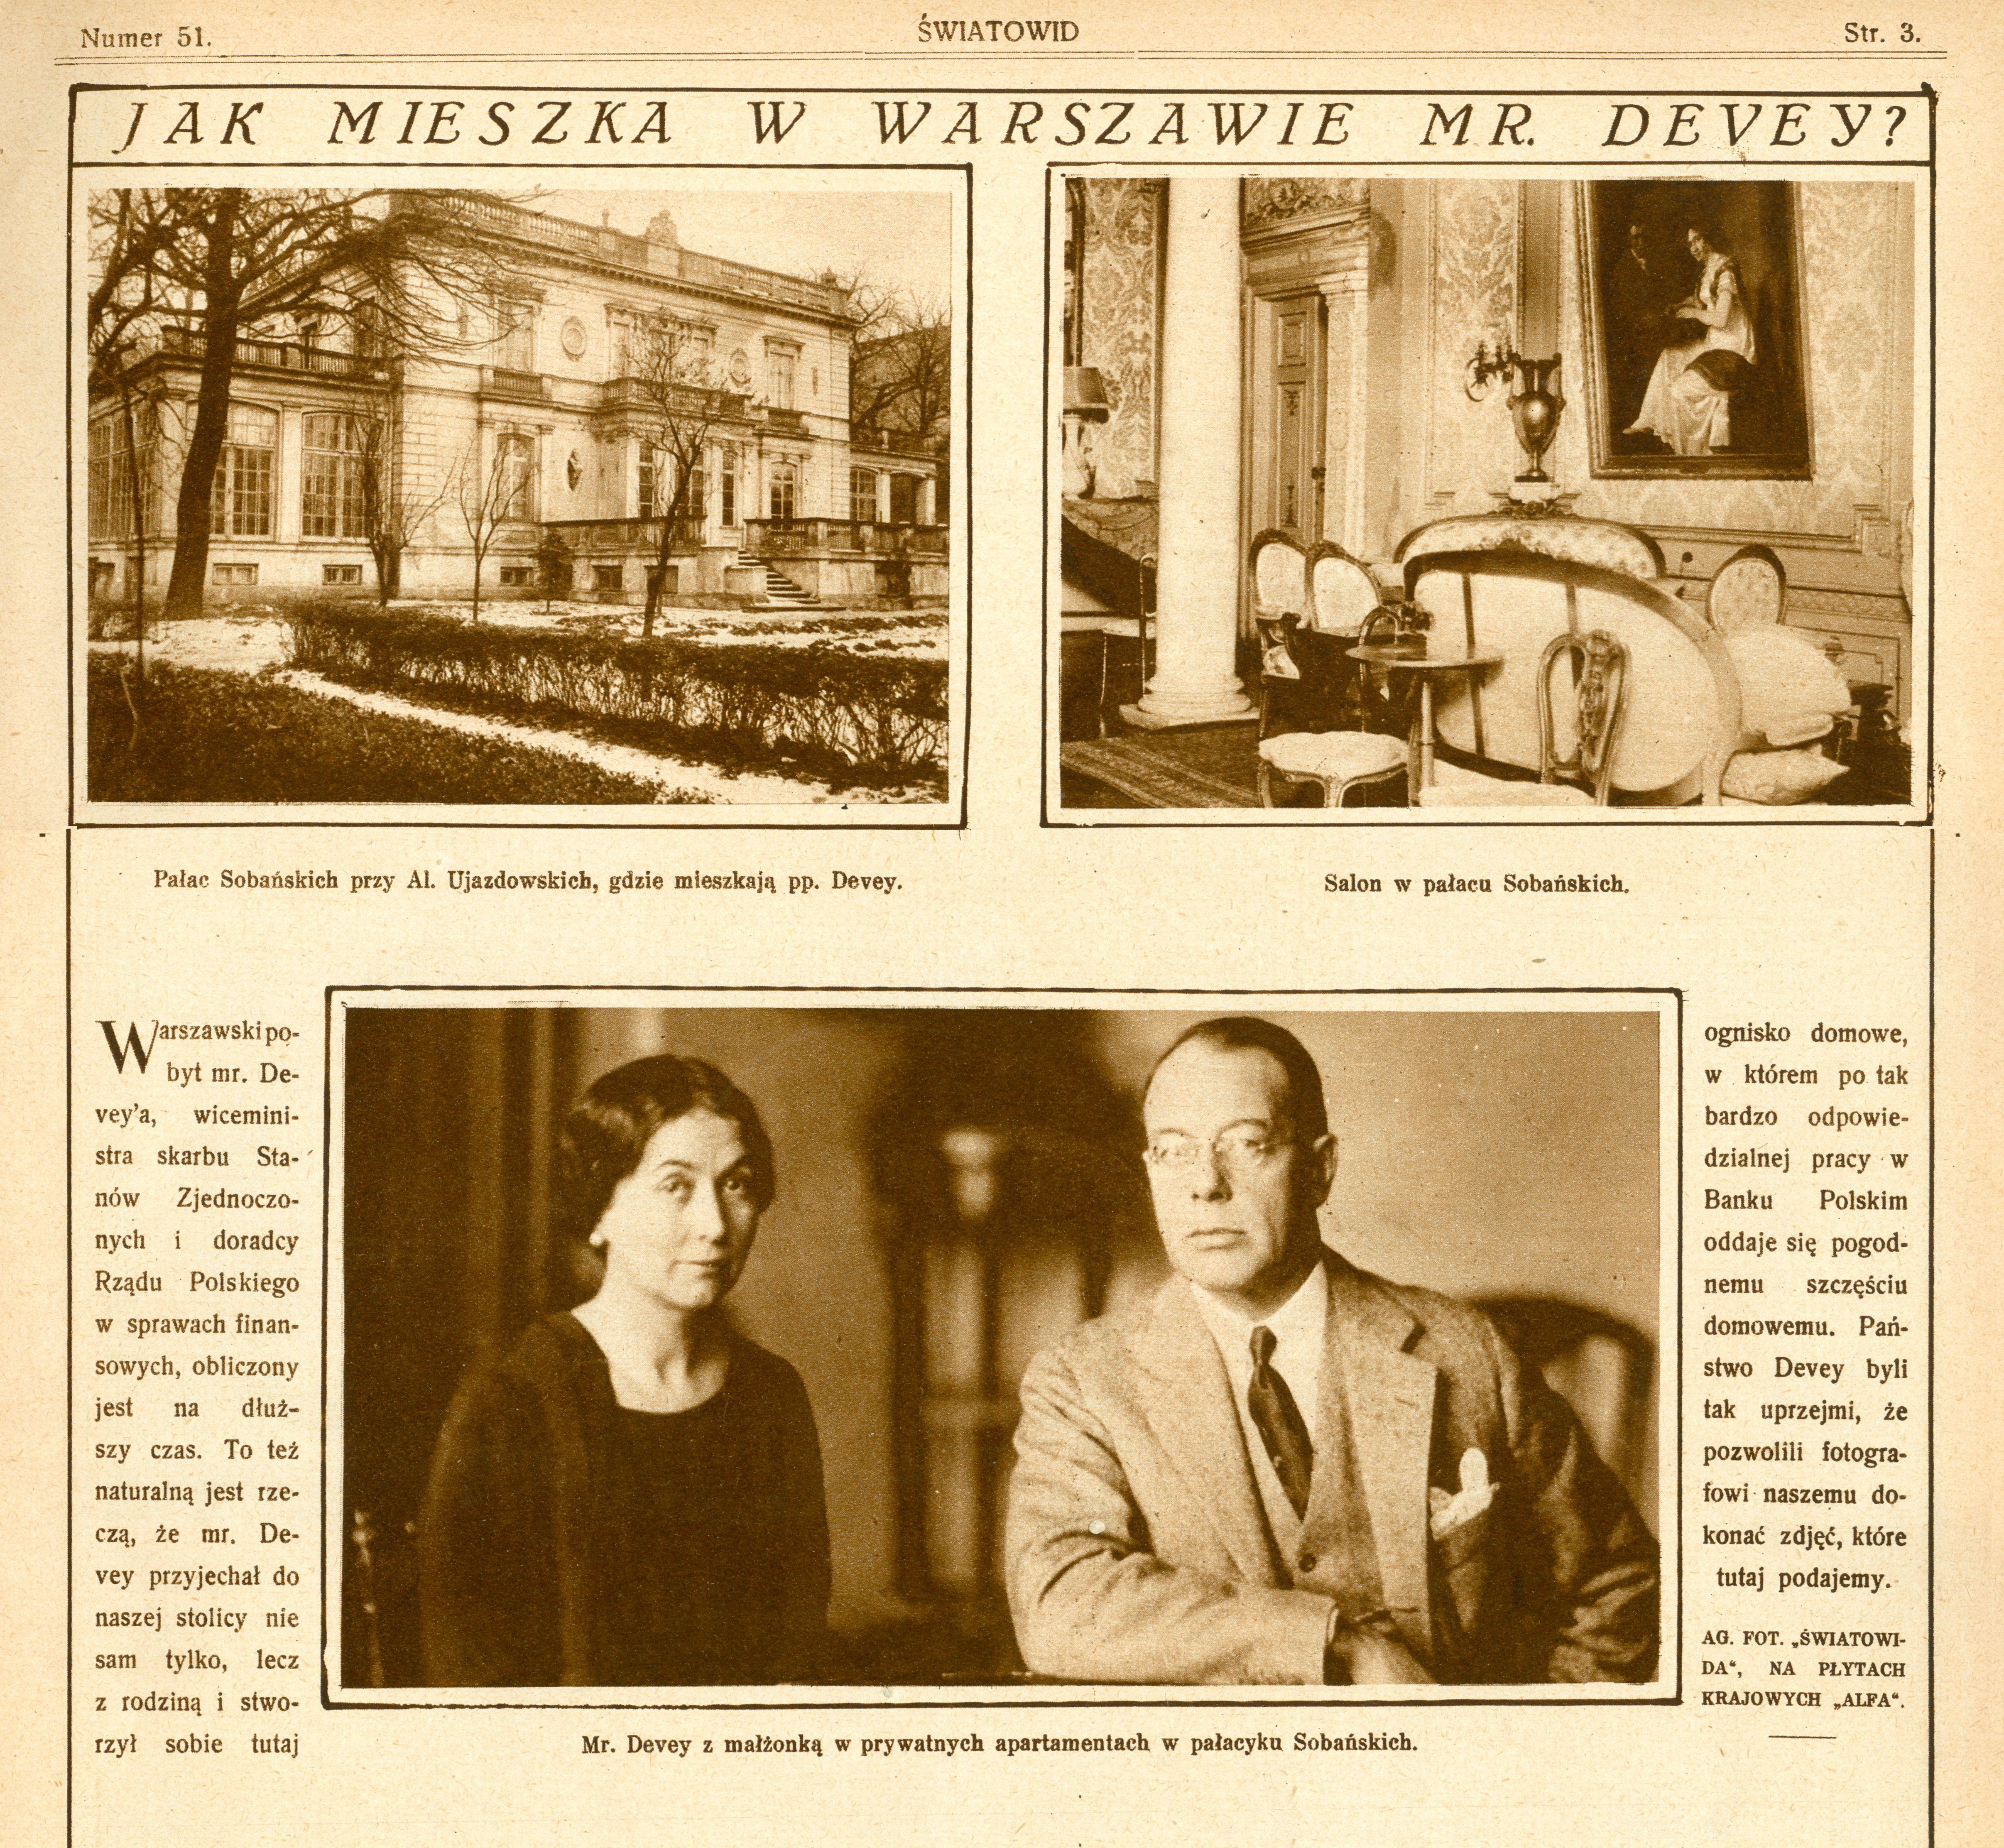 Charles S. Dewey_Swaitowid nr 51 17.12.1927 palac Sobanskich Warszawa 1